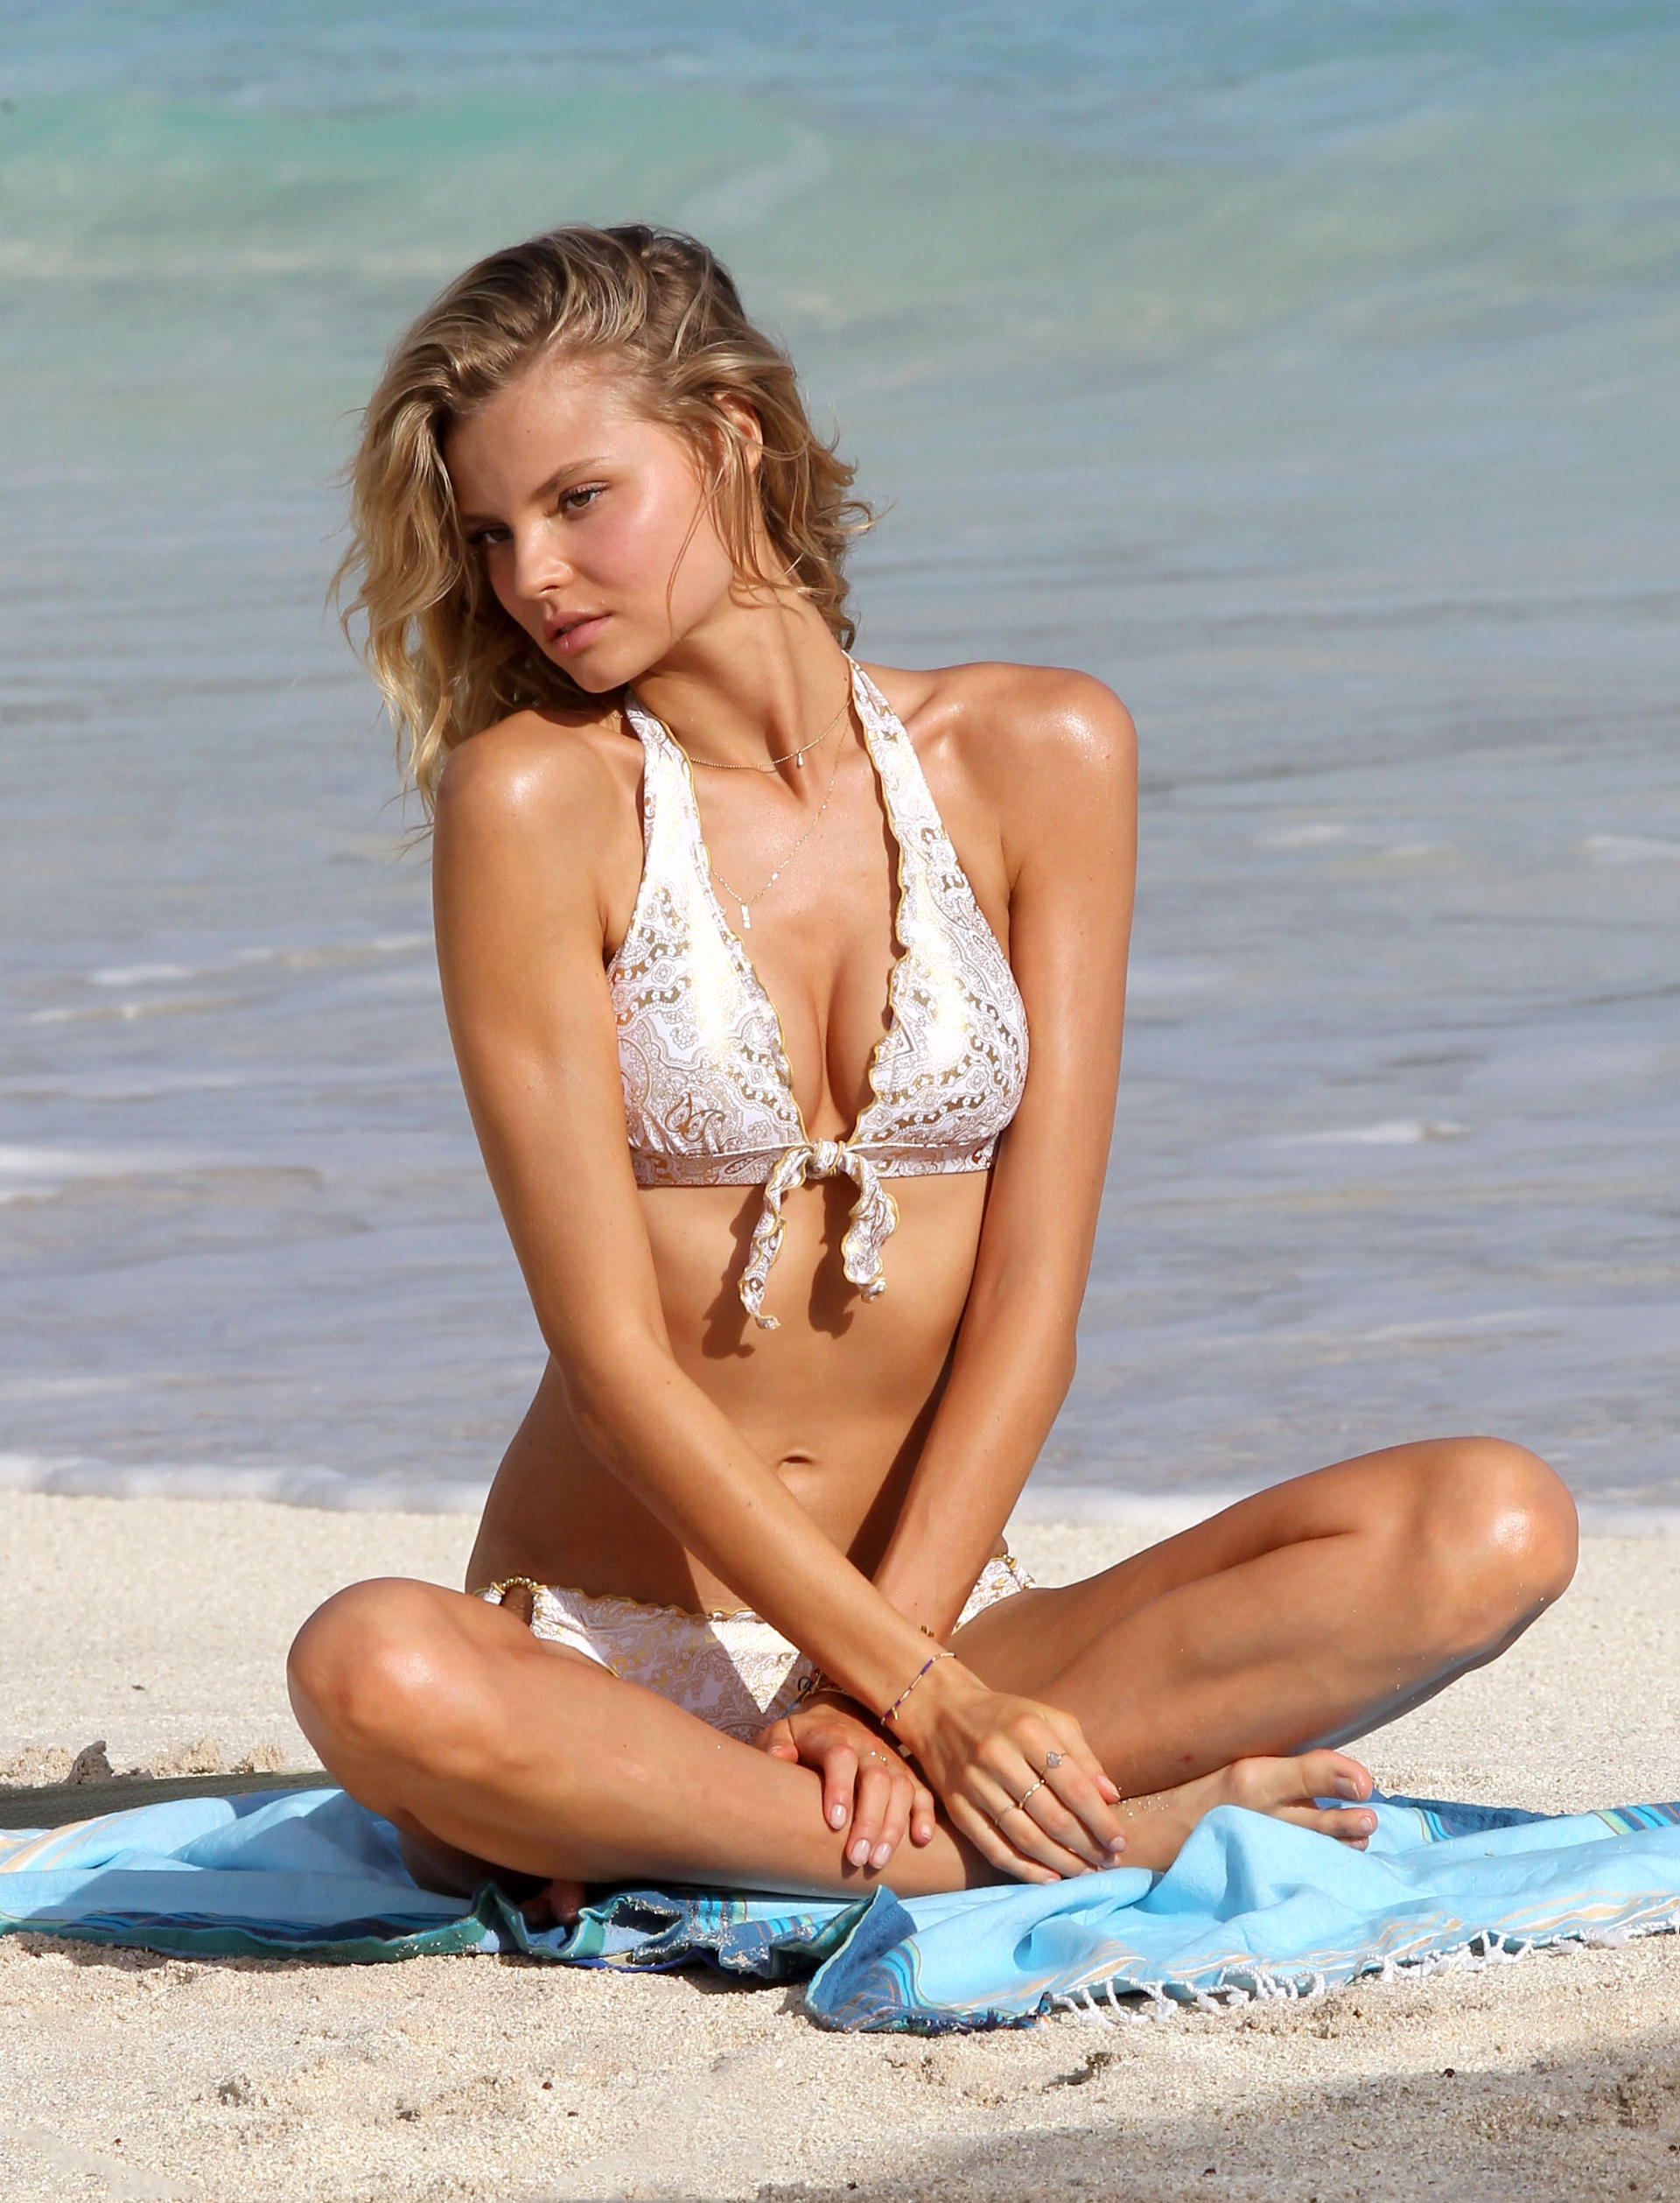 Magda 01 vacation italy bibione - 1 part 2